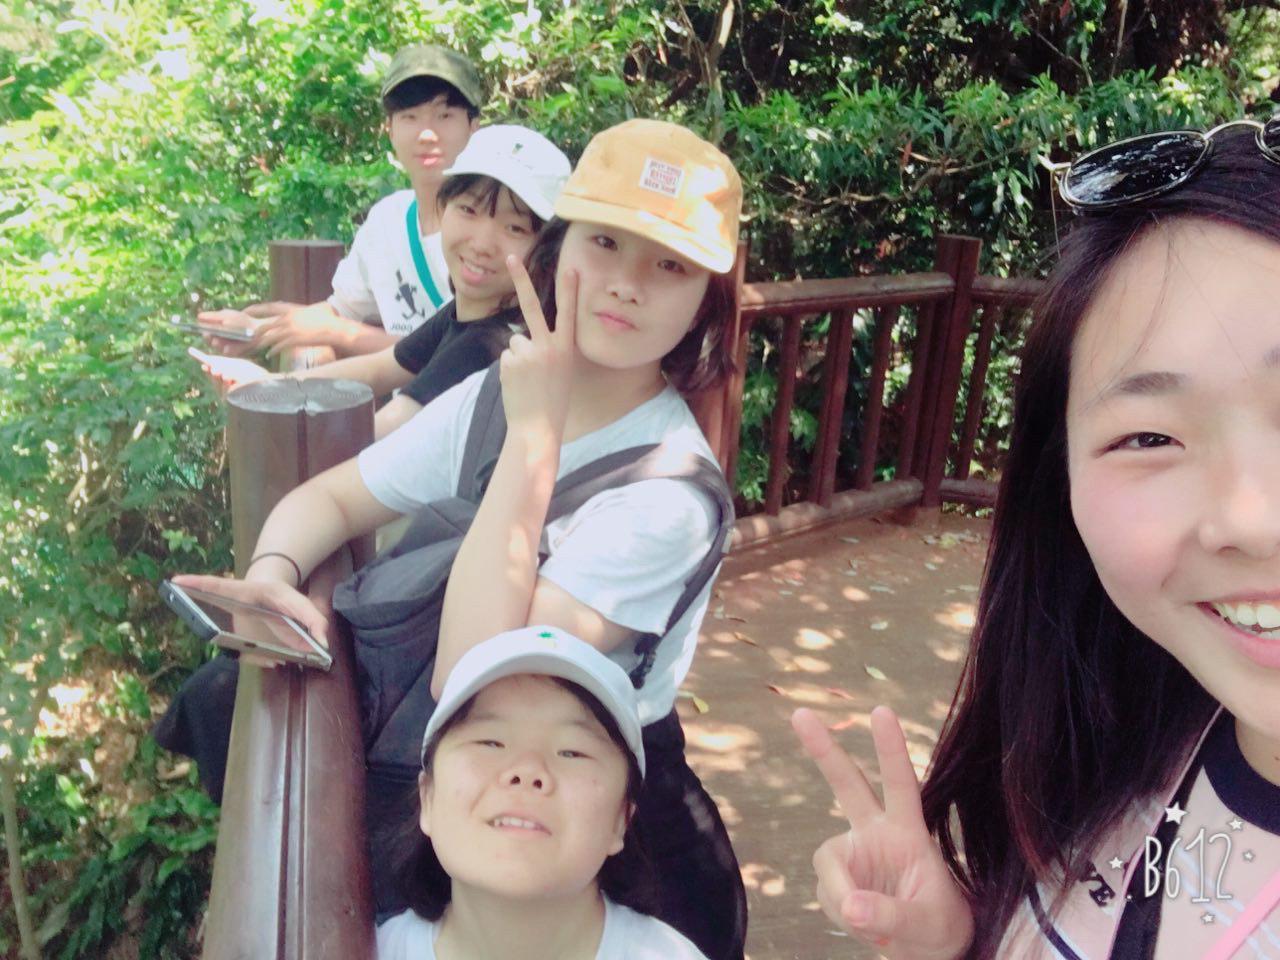 photo_2017-05-29_14-10-34.jpg